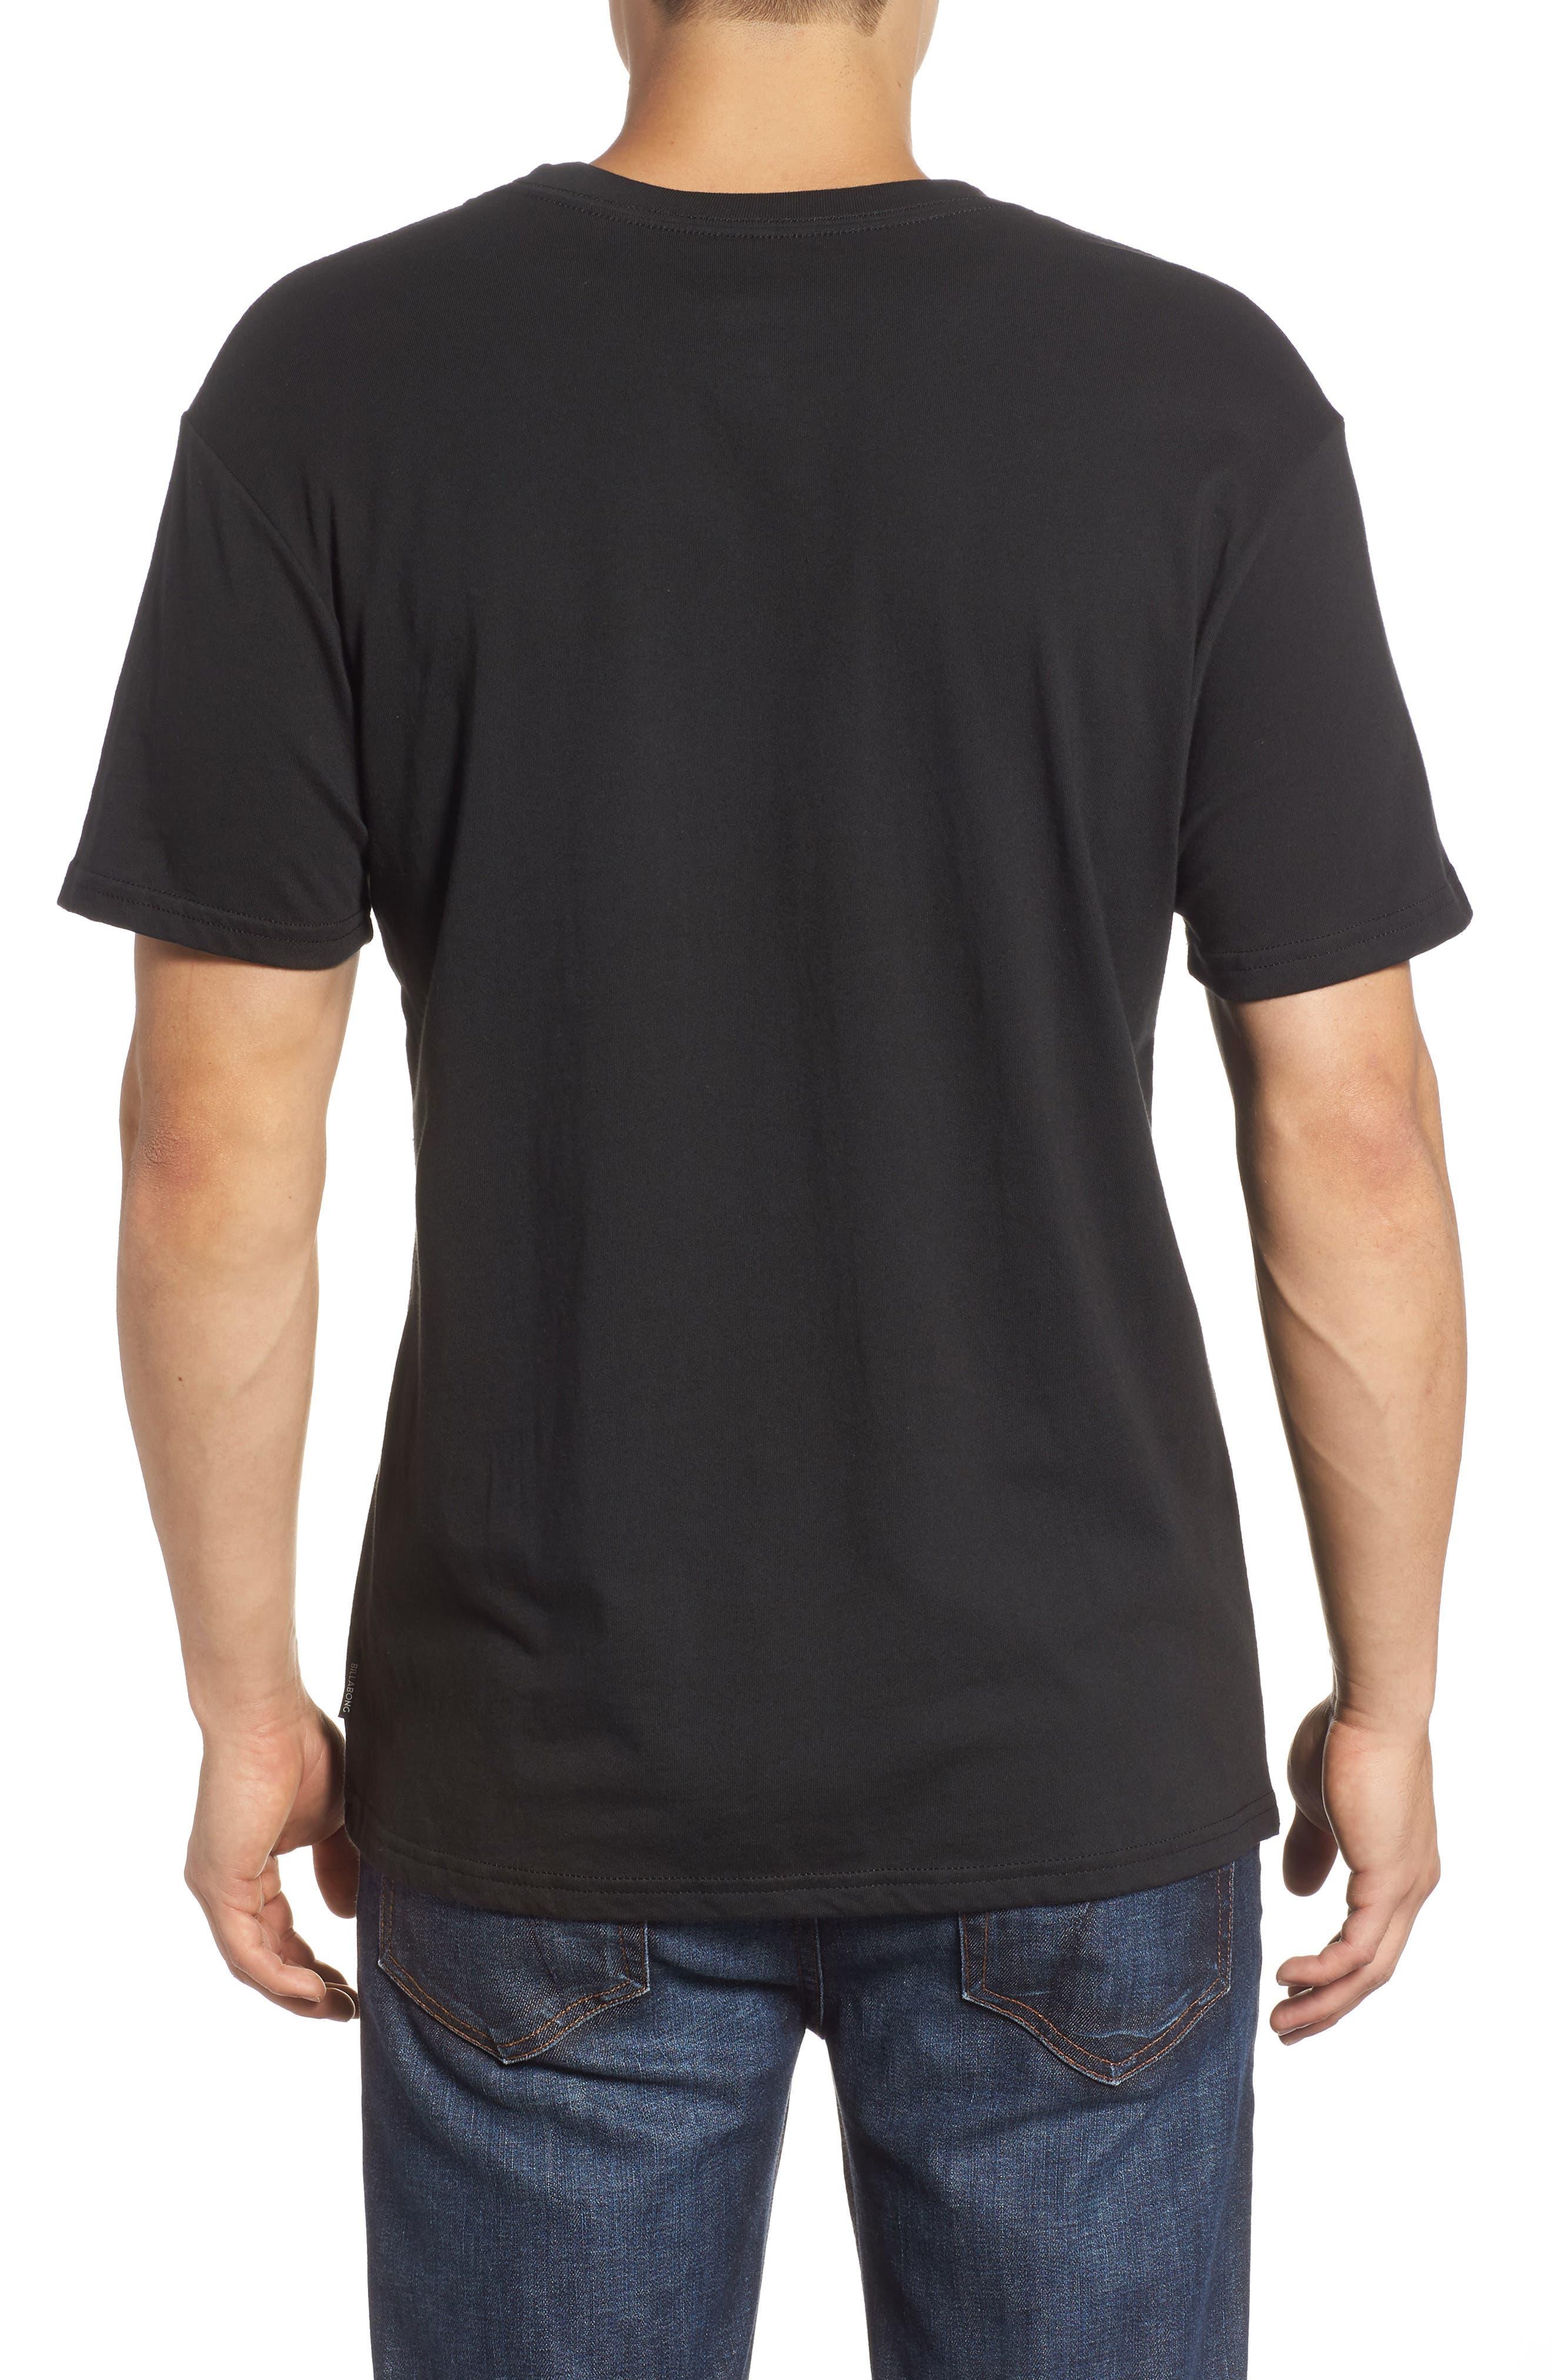 Access Graphic T-Shirt,                             Alternate thumbnail 2, color,                             BLACK